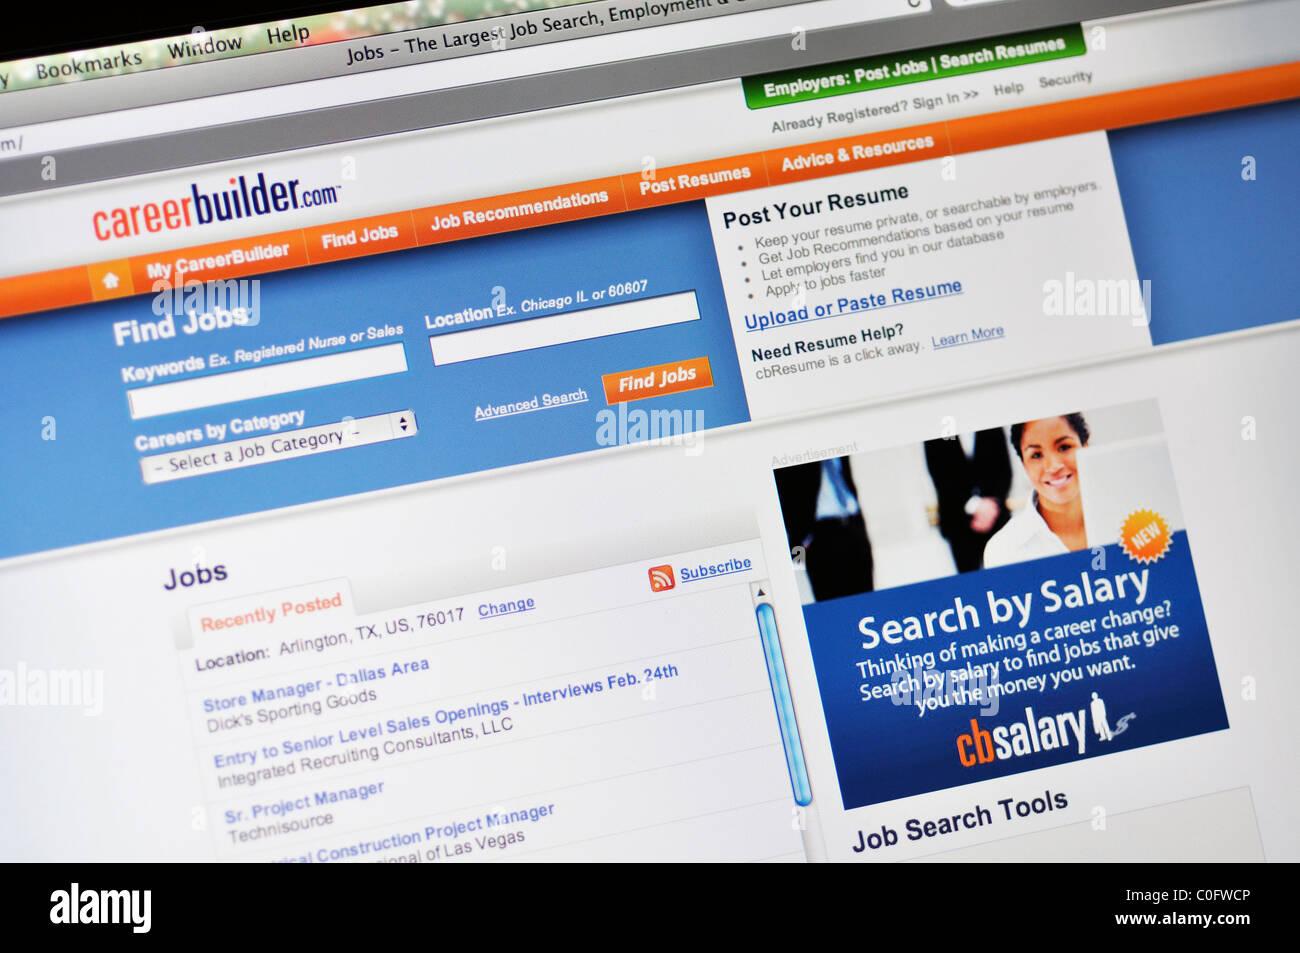 Career Builder job search website - Stock Image